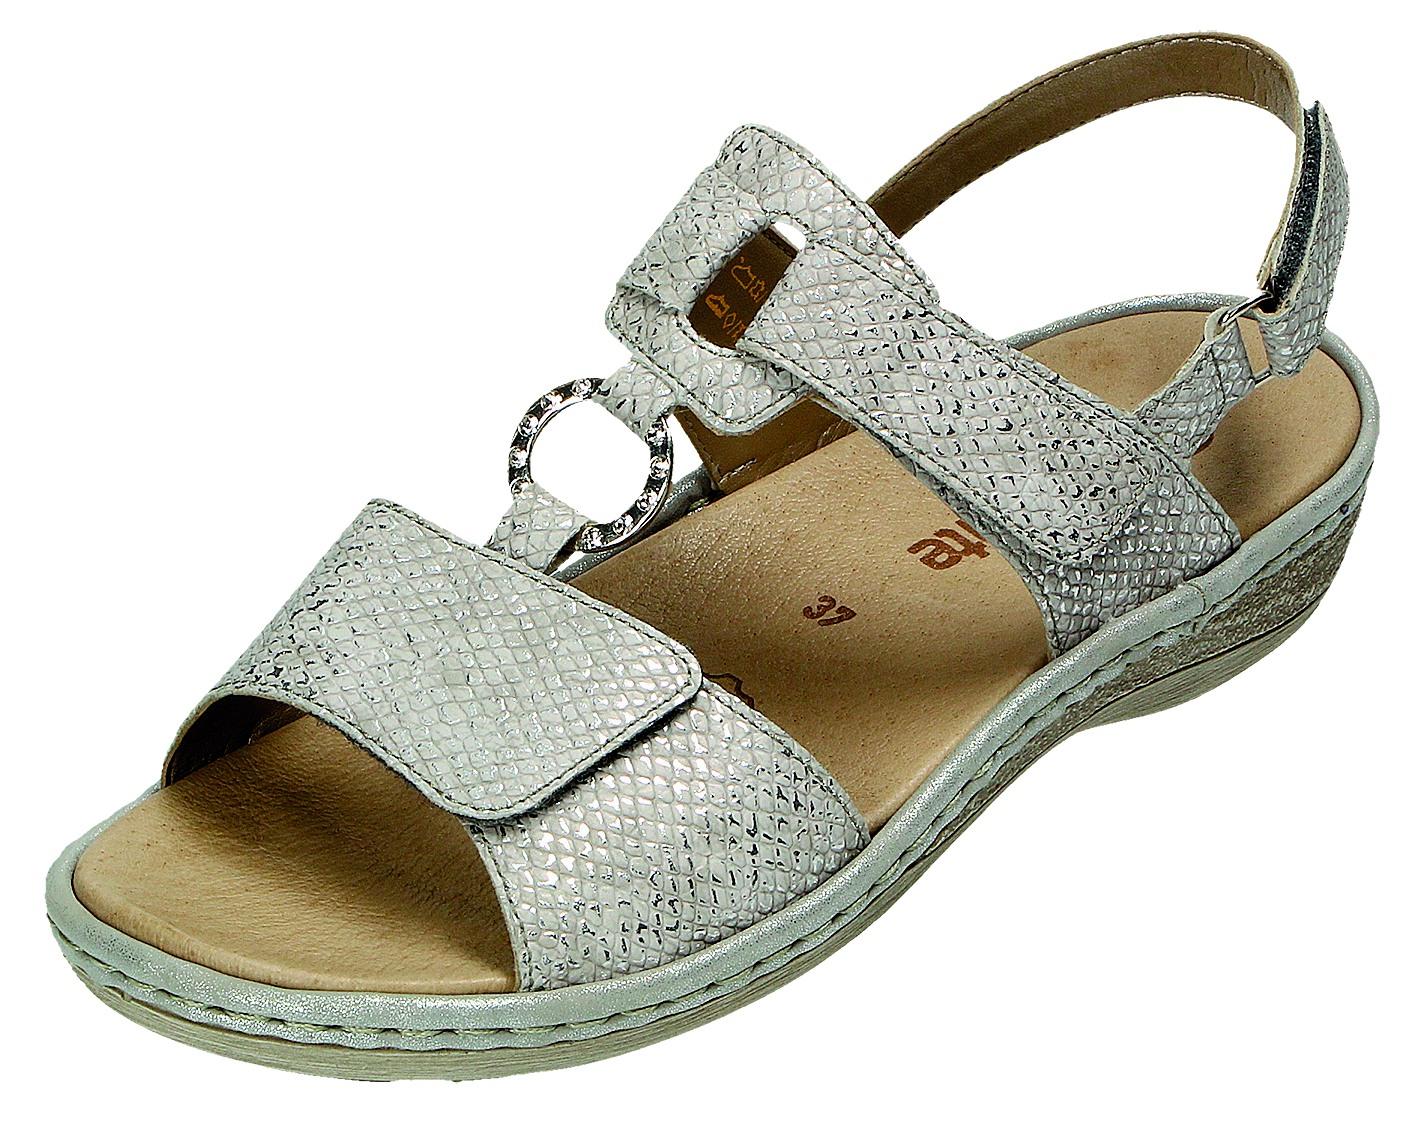 Remonte Damen Sandale-Pantolette D.Sandaleette Silber D7648 90 SILBER